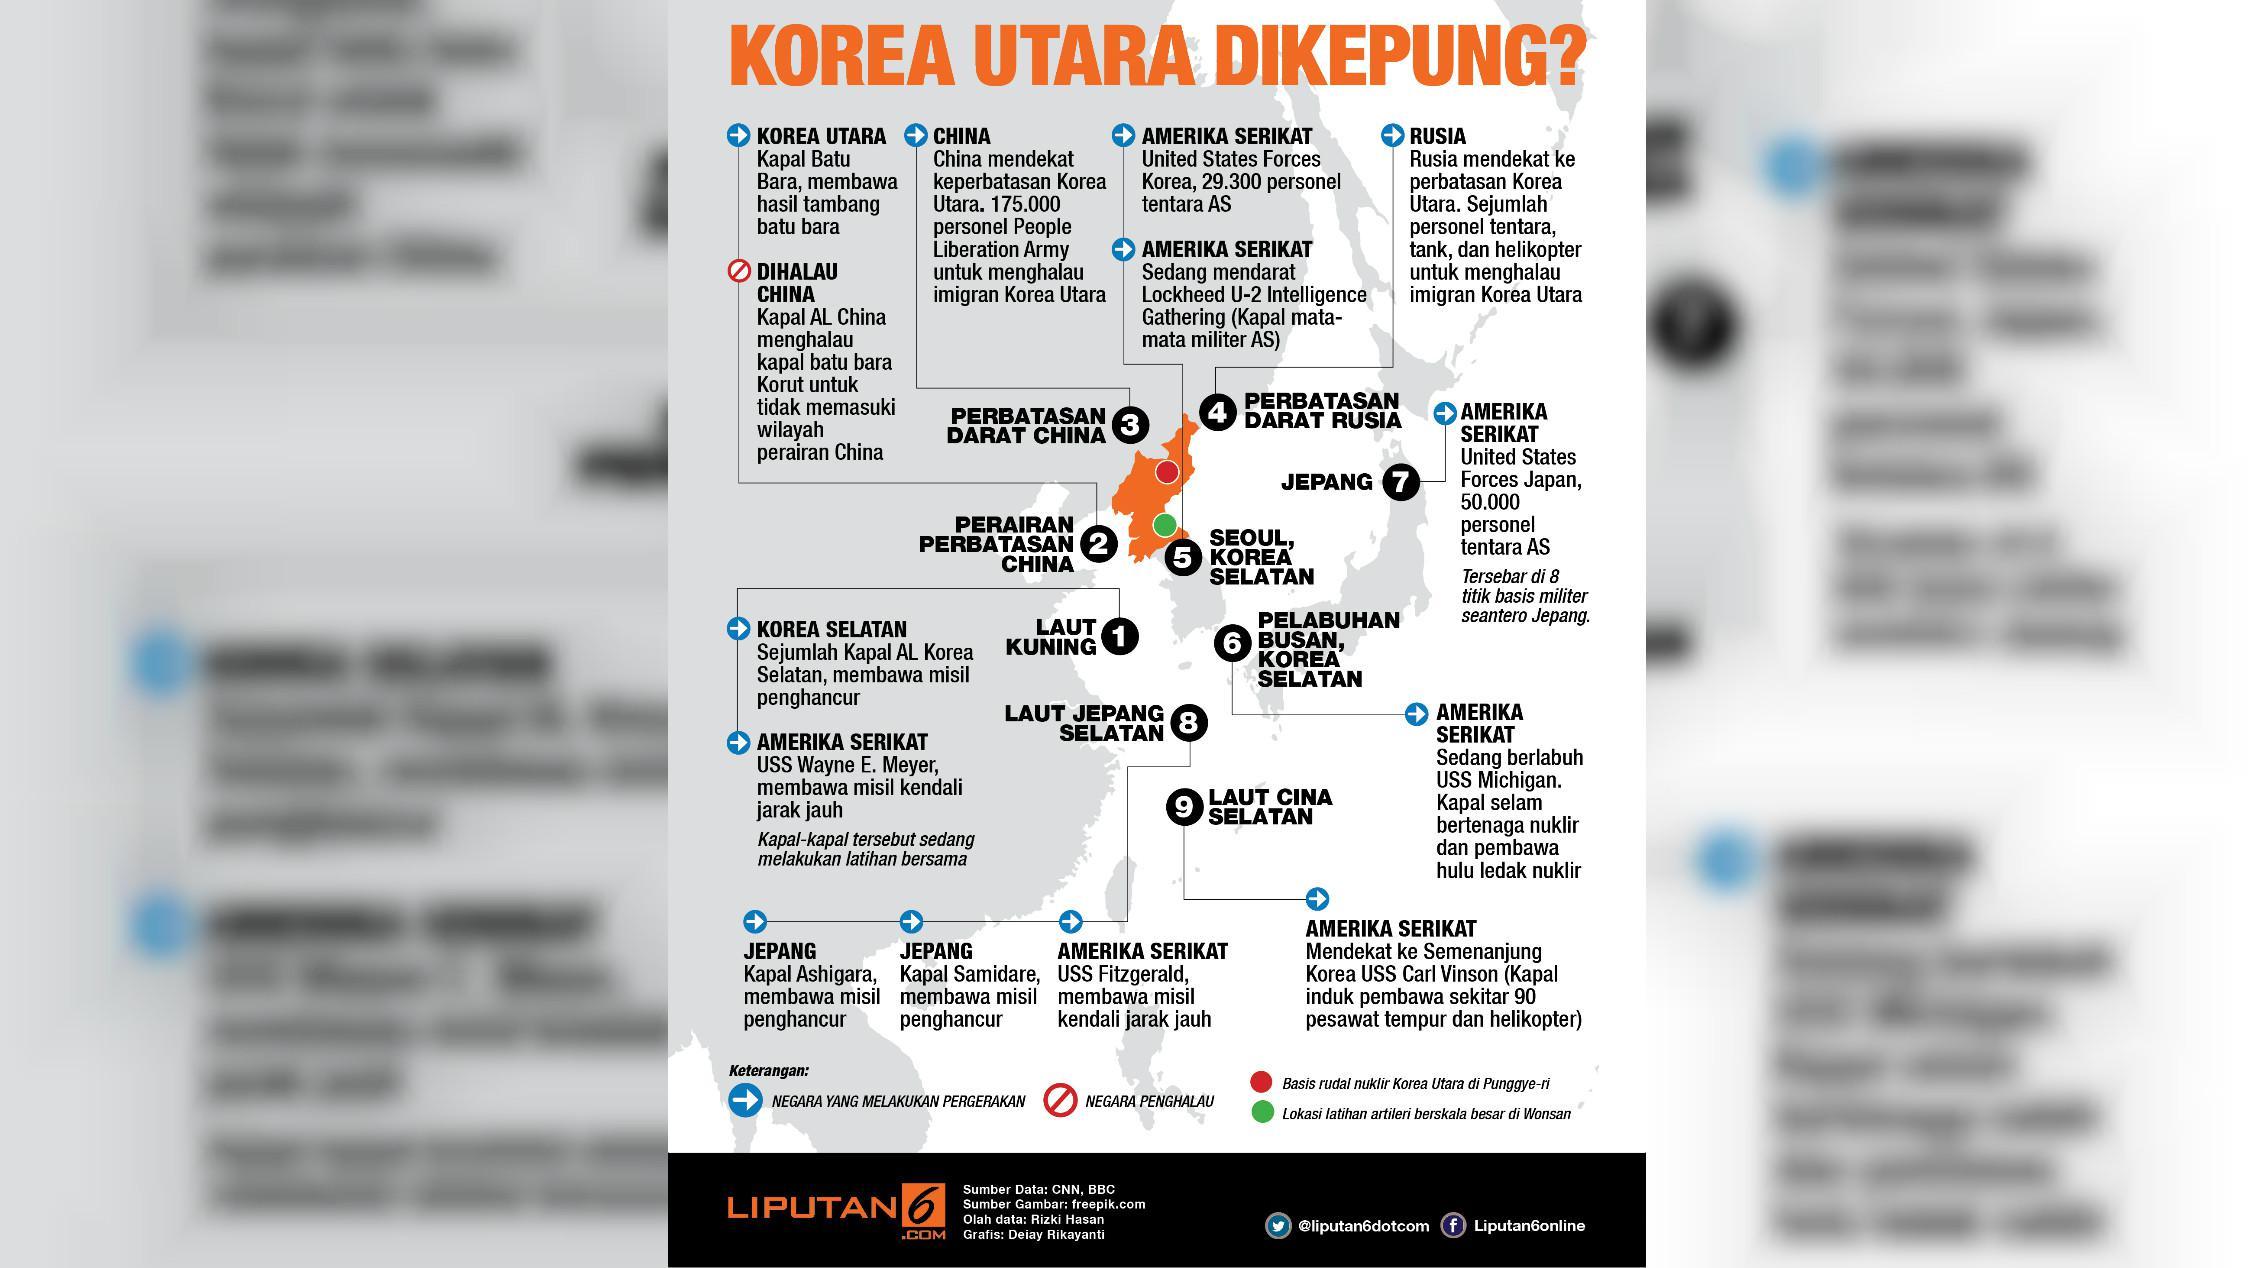 Korea Utara Dikepung? (Deisy Rika, Rizki Akbar Hasan/liputan6.com)